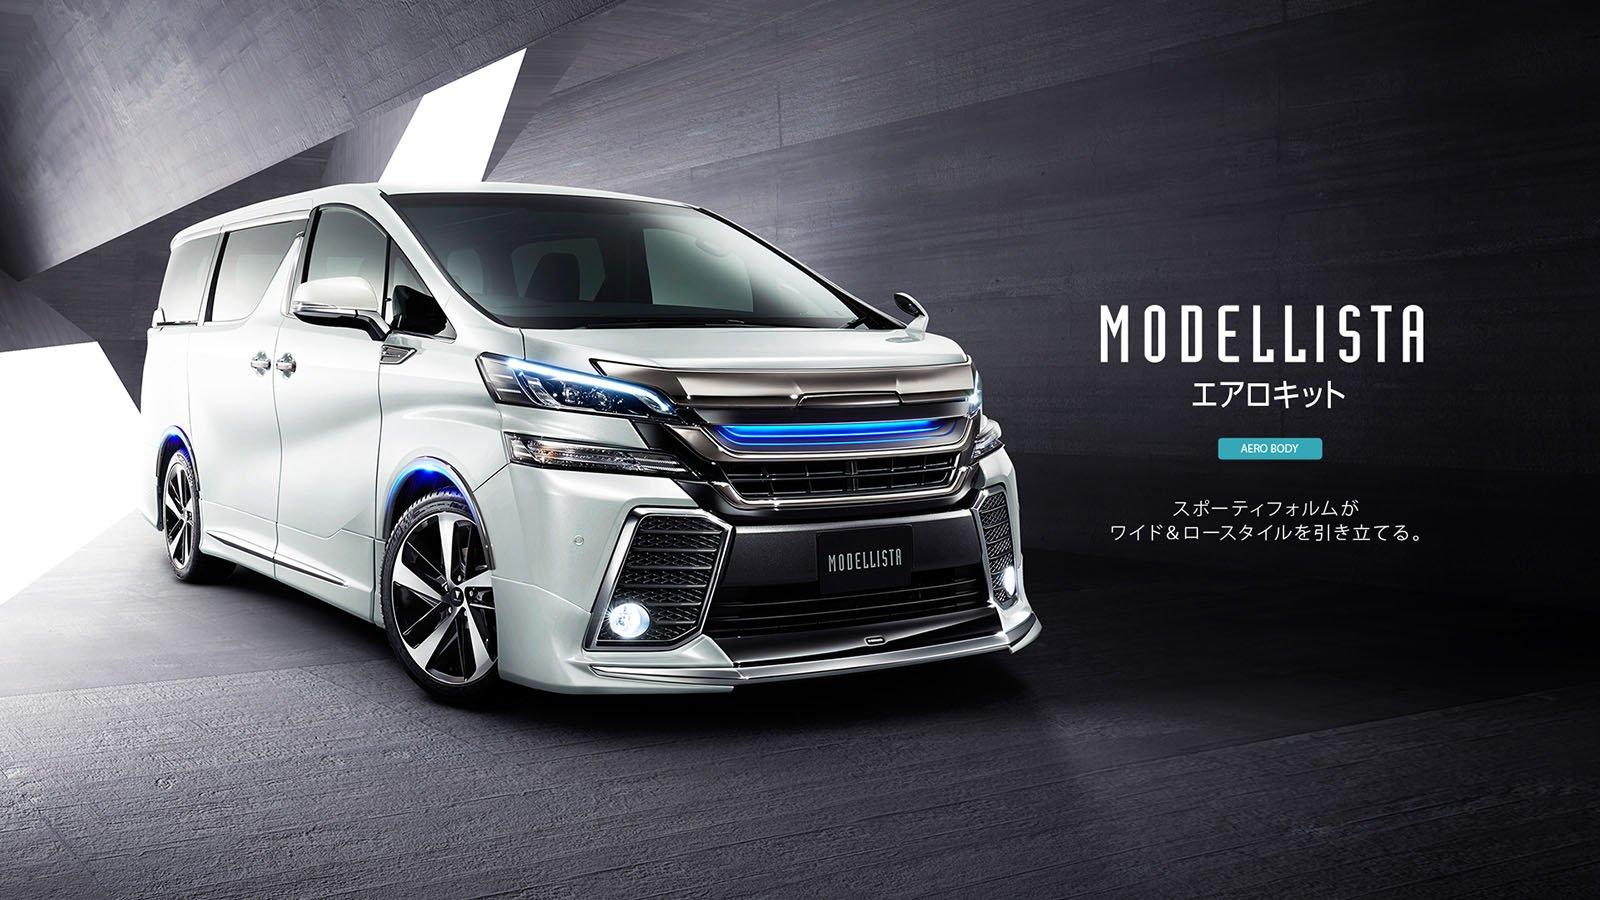 2016 Toyota Alphard, Vellfire get Modellista body kits ...